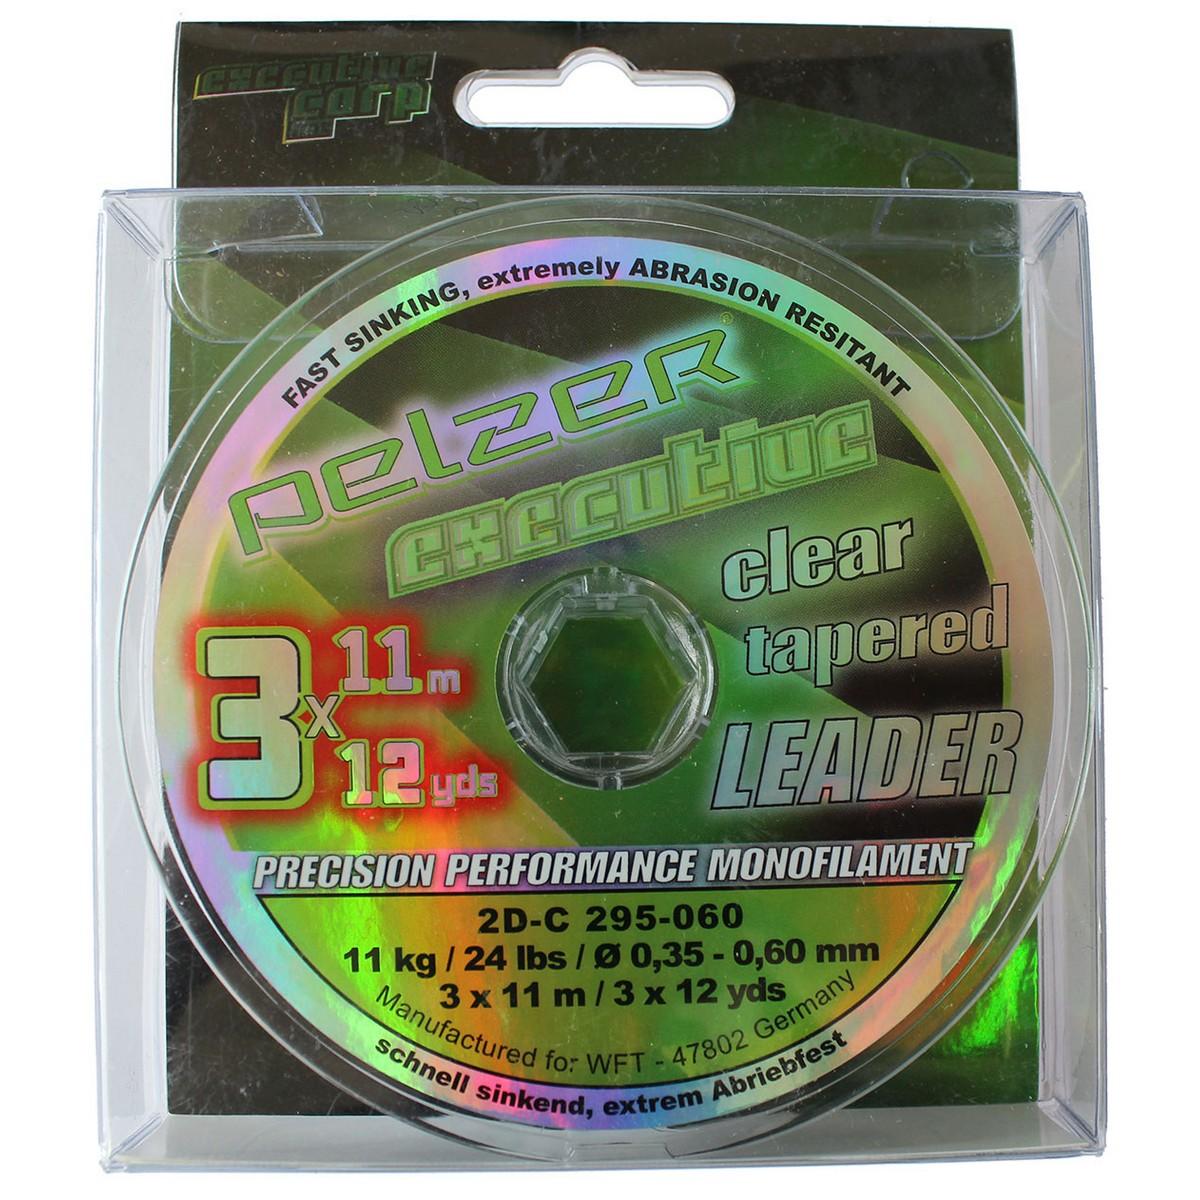 Pelzer Executive Tapered Leader